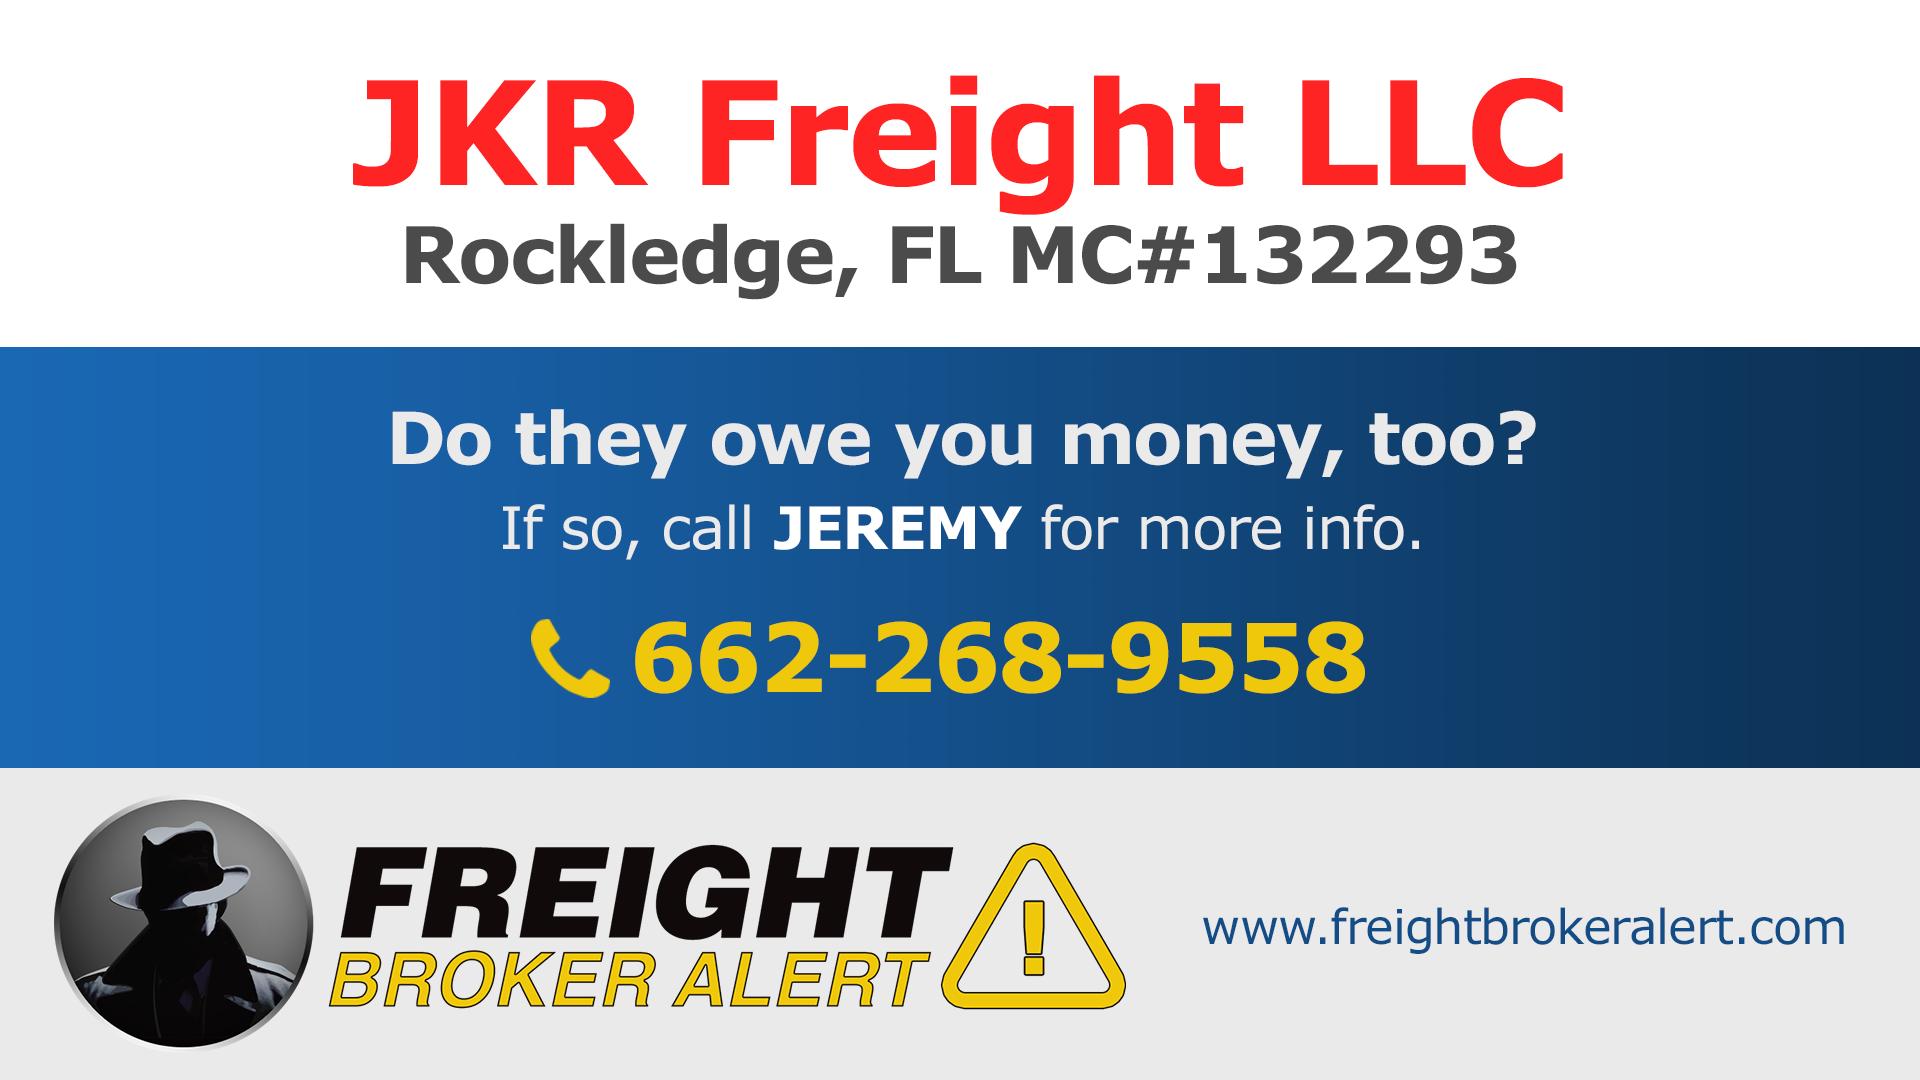 JKR Freight LLC Florida